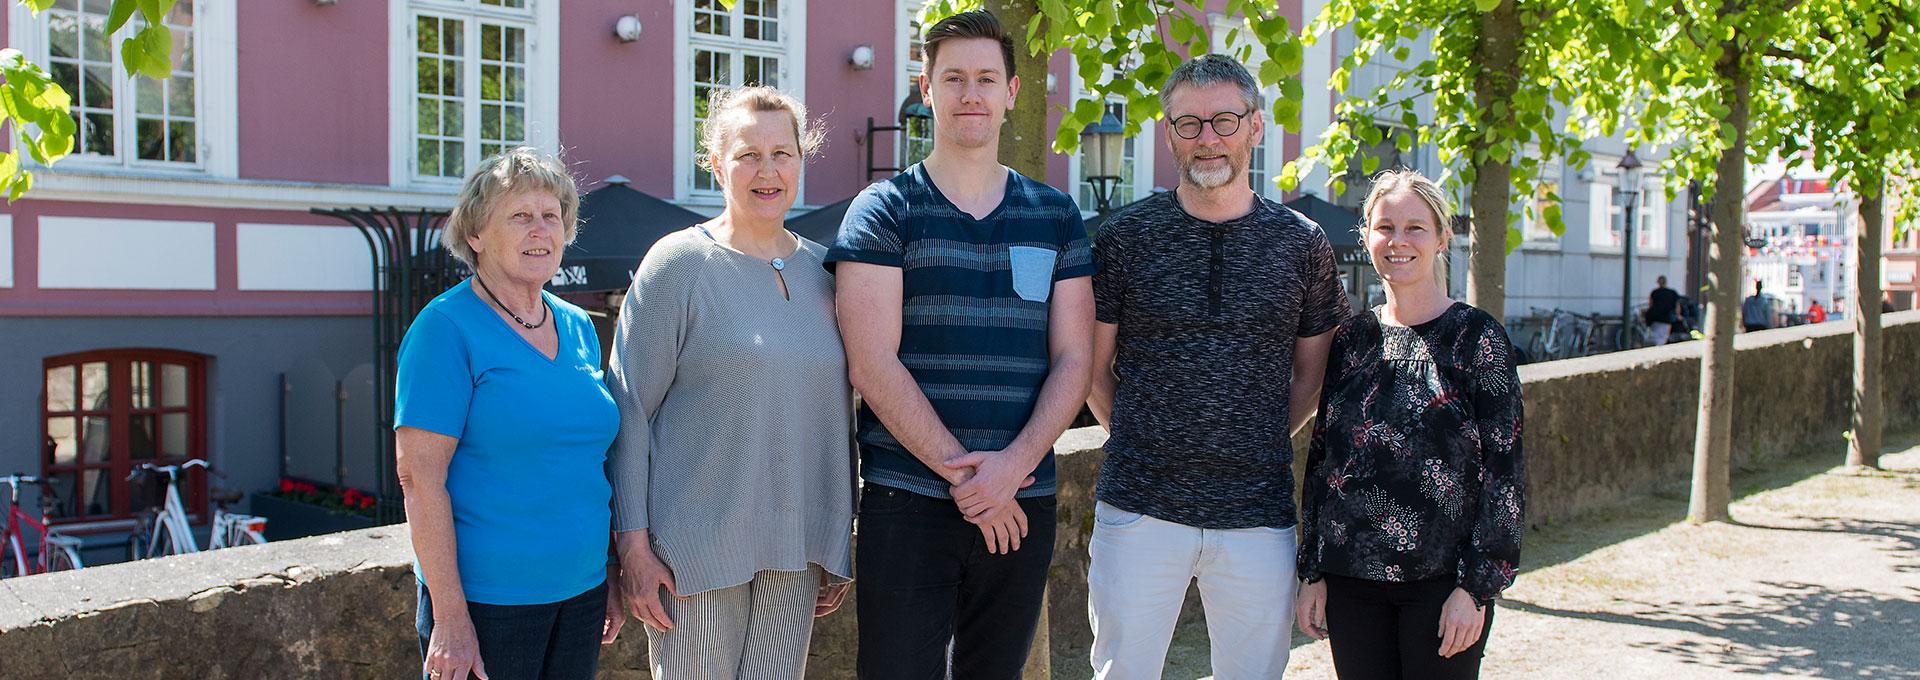 Kiropraktorerne i Viborg